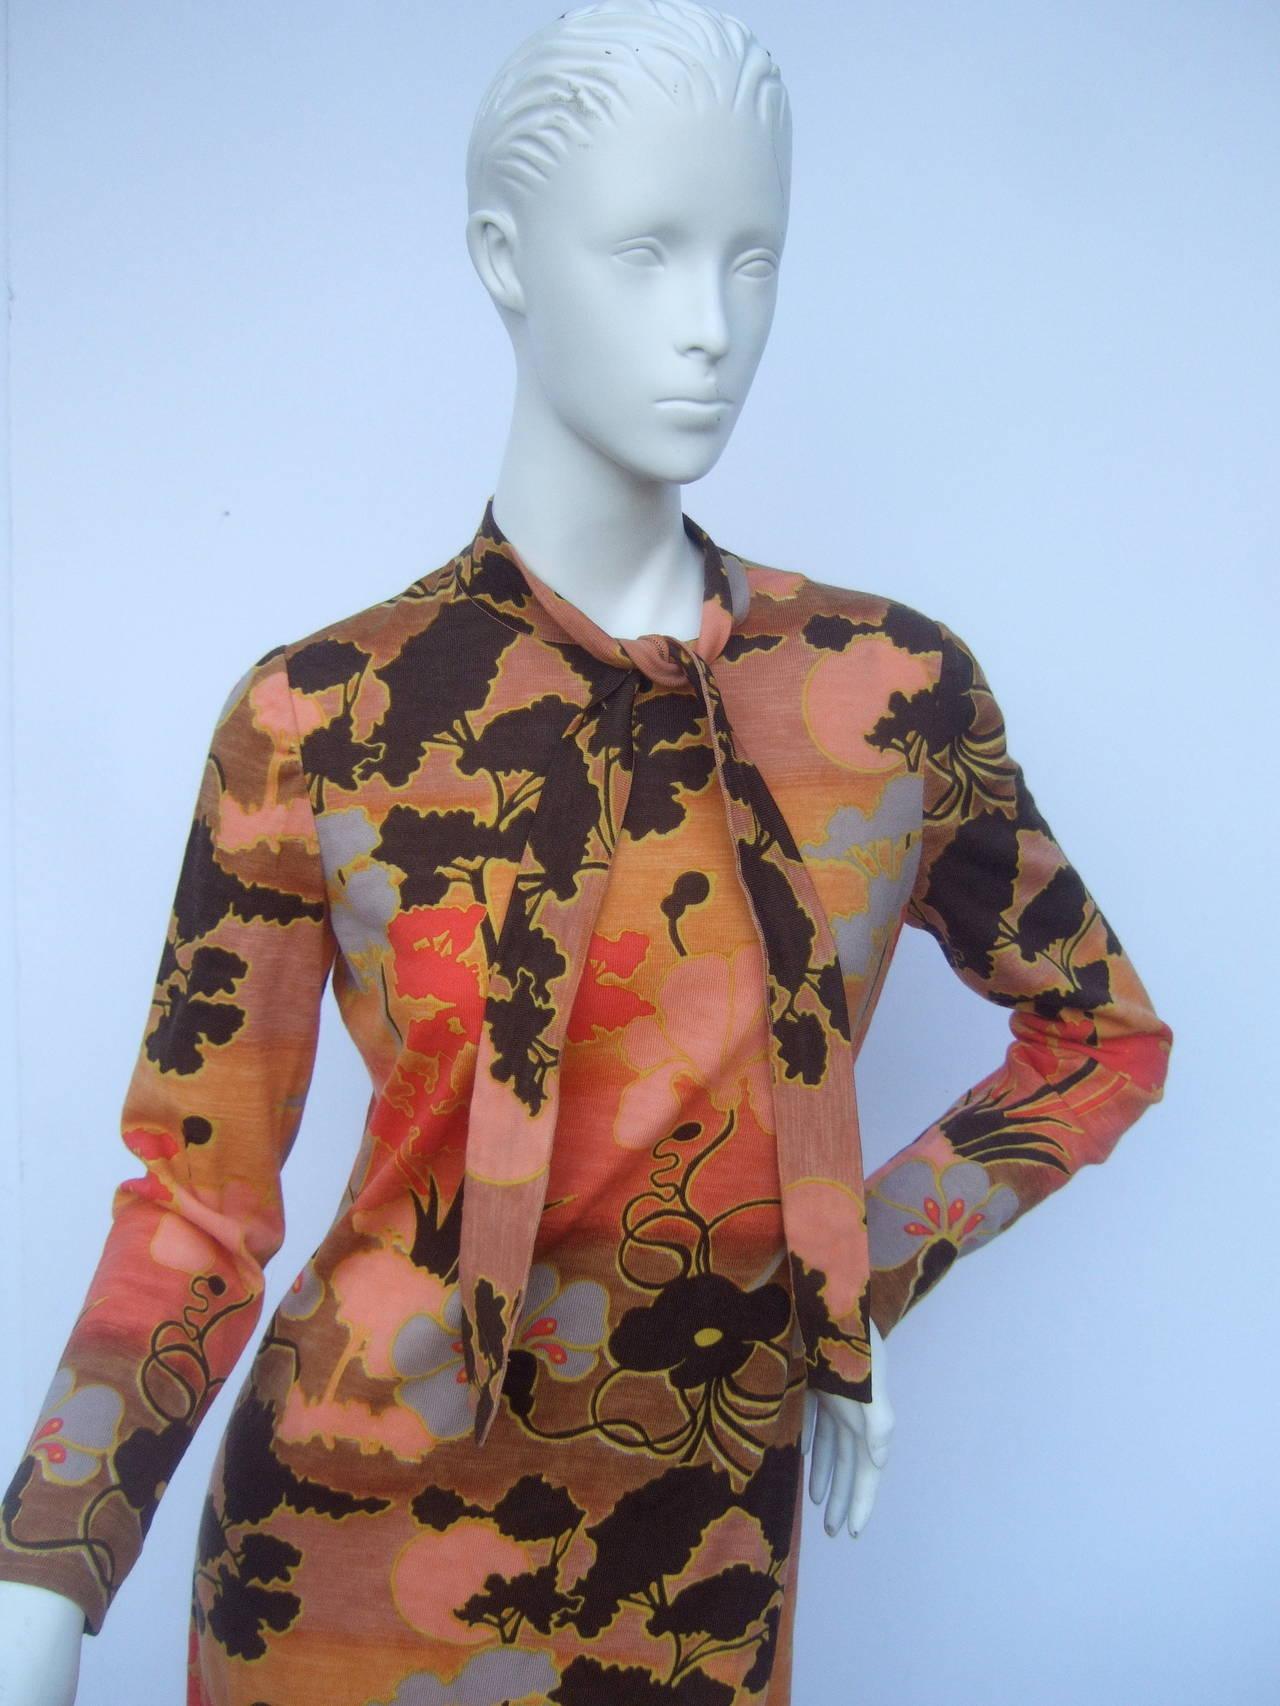 Women's Italian Floral Print Merino Wool Knit Dress c 1970s For Sale